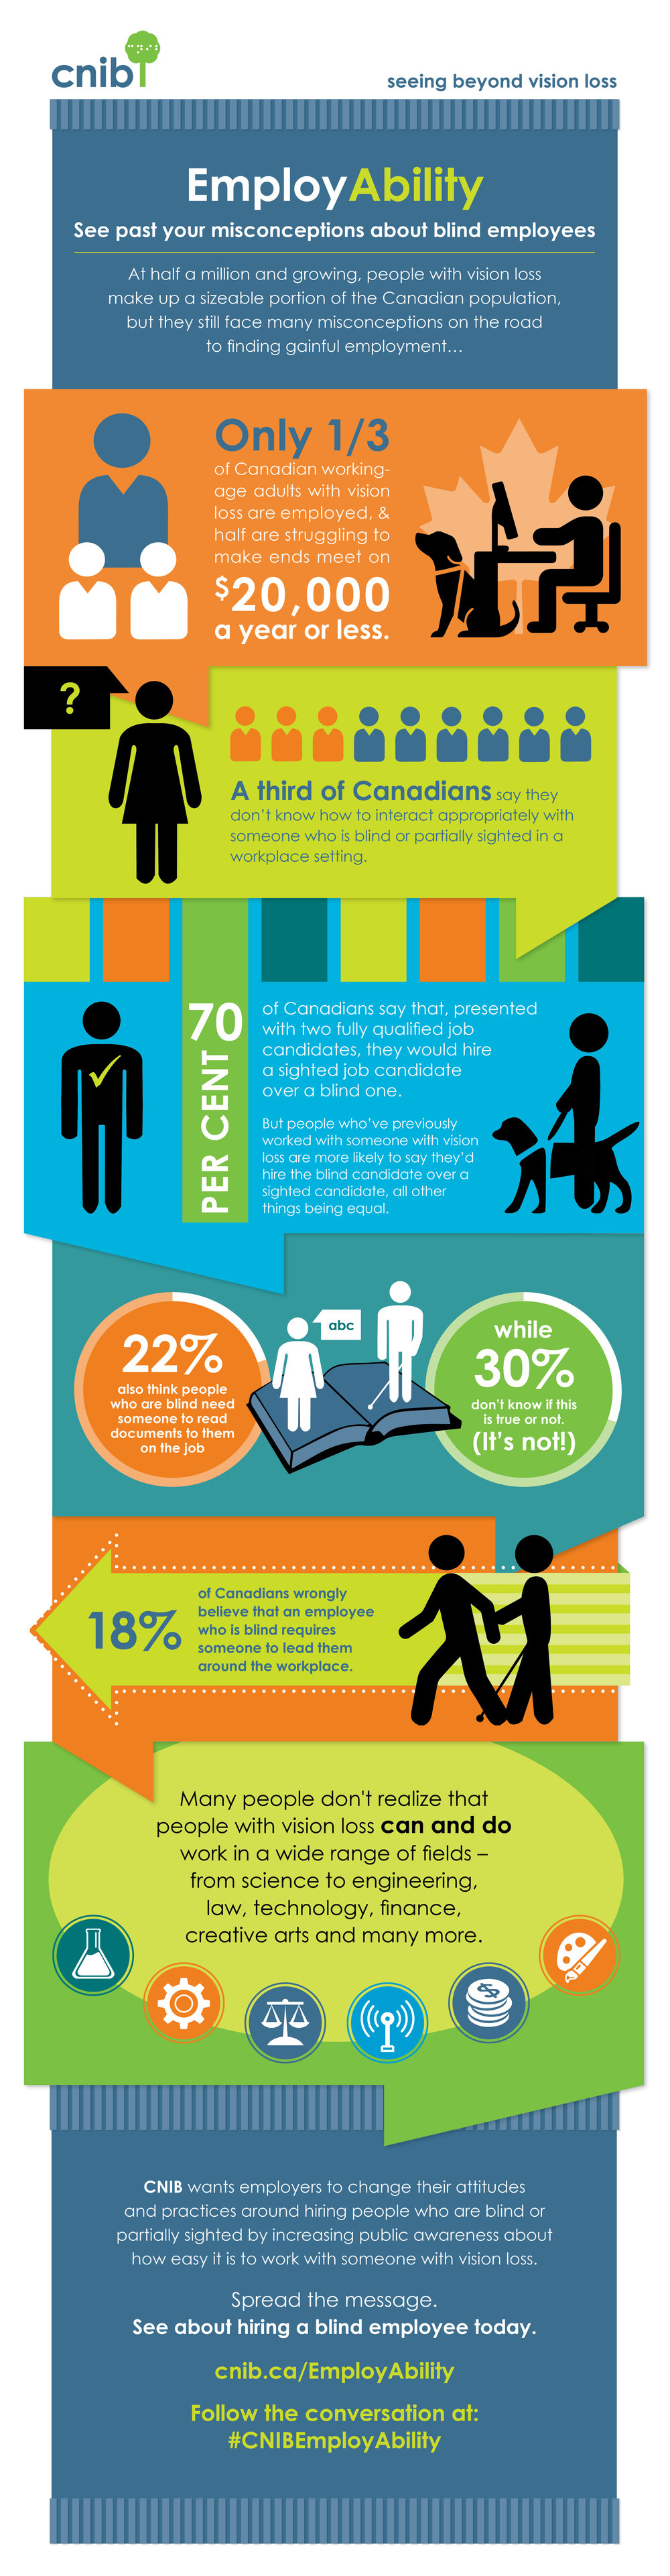 CNIB Infographic Employability